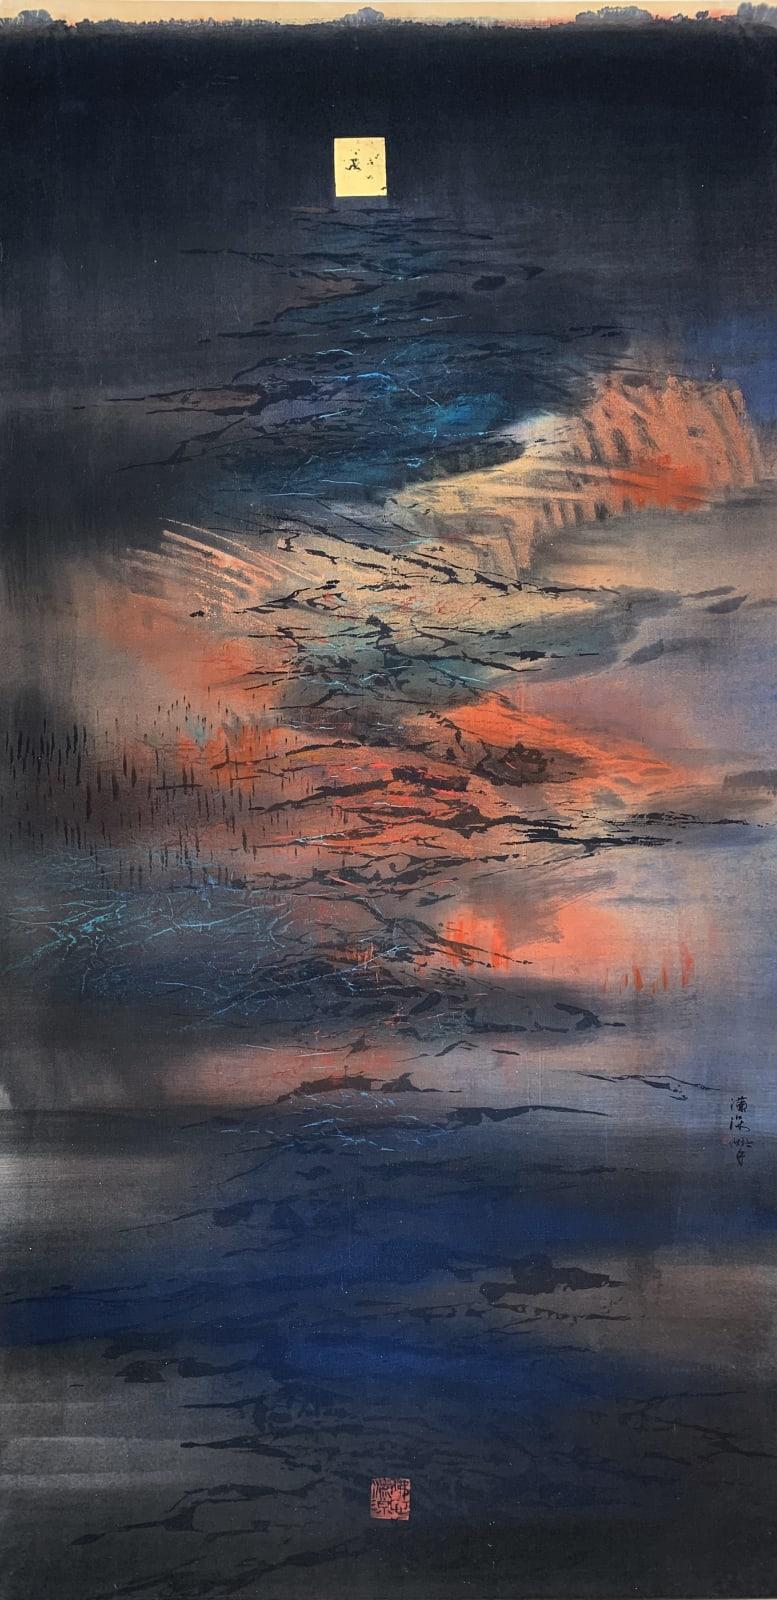 Kwok Hon Sum 郭漢深, Chaotic Boundary 沌混域界, 1989